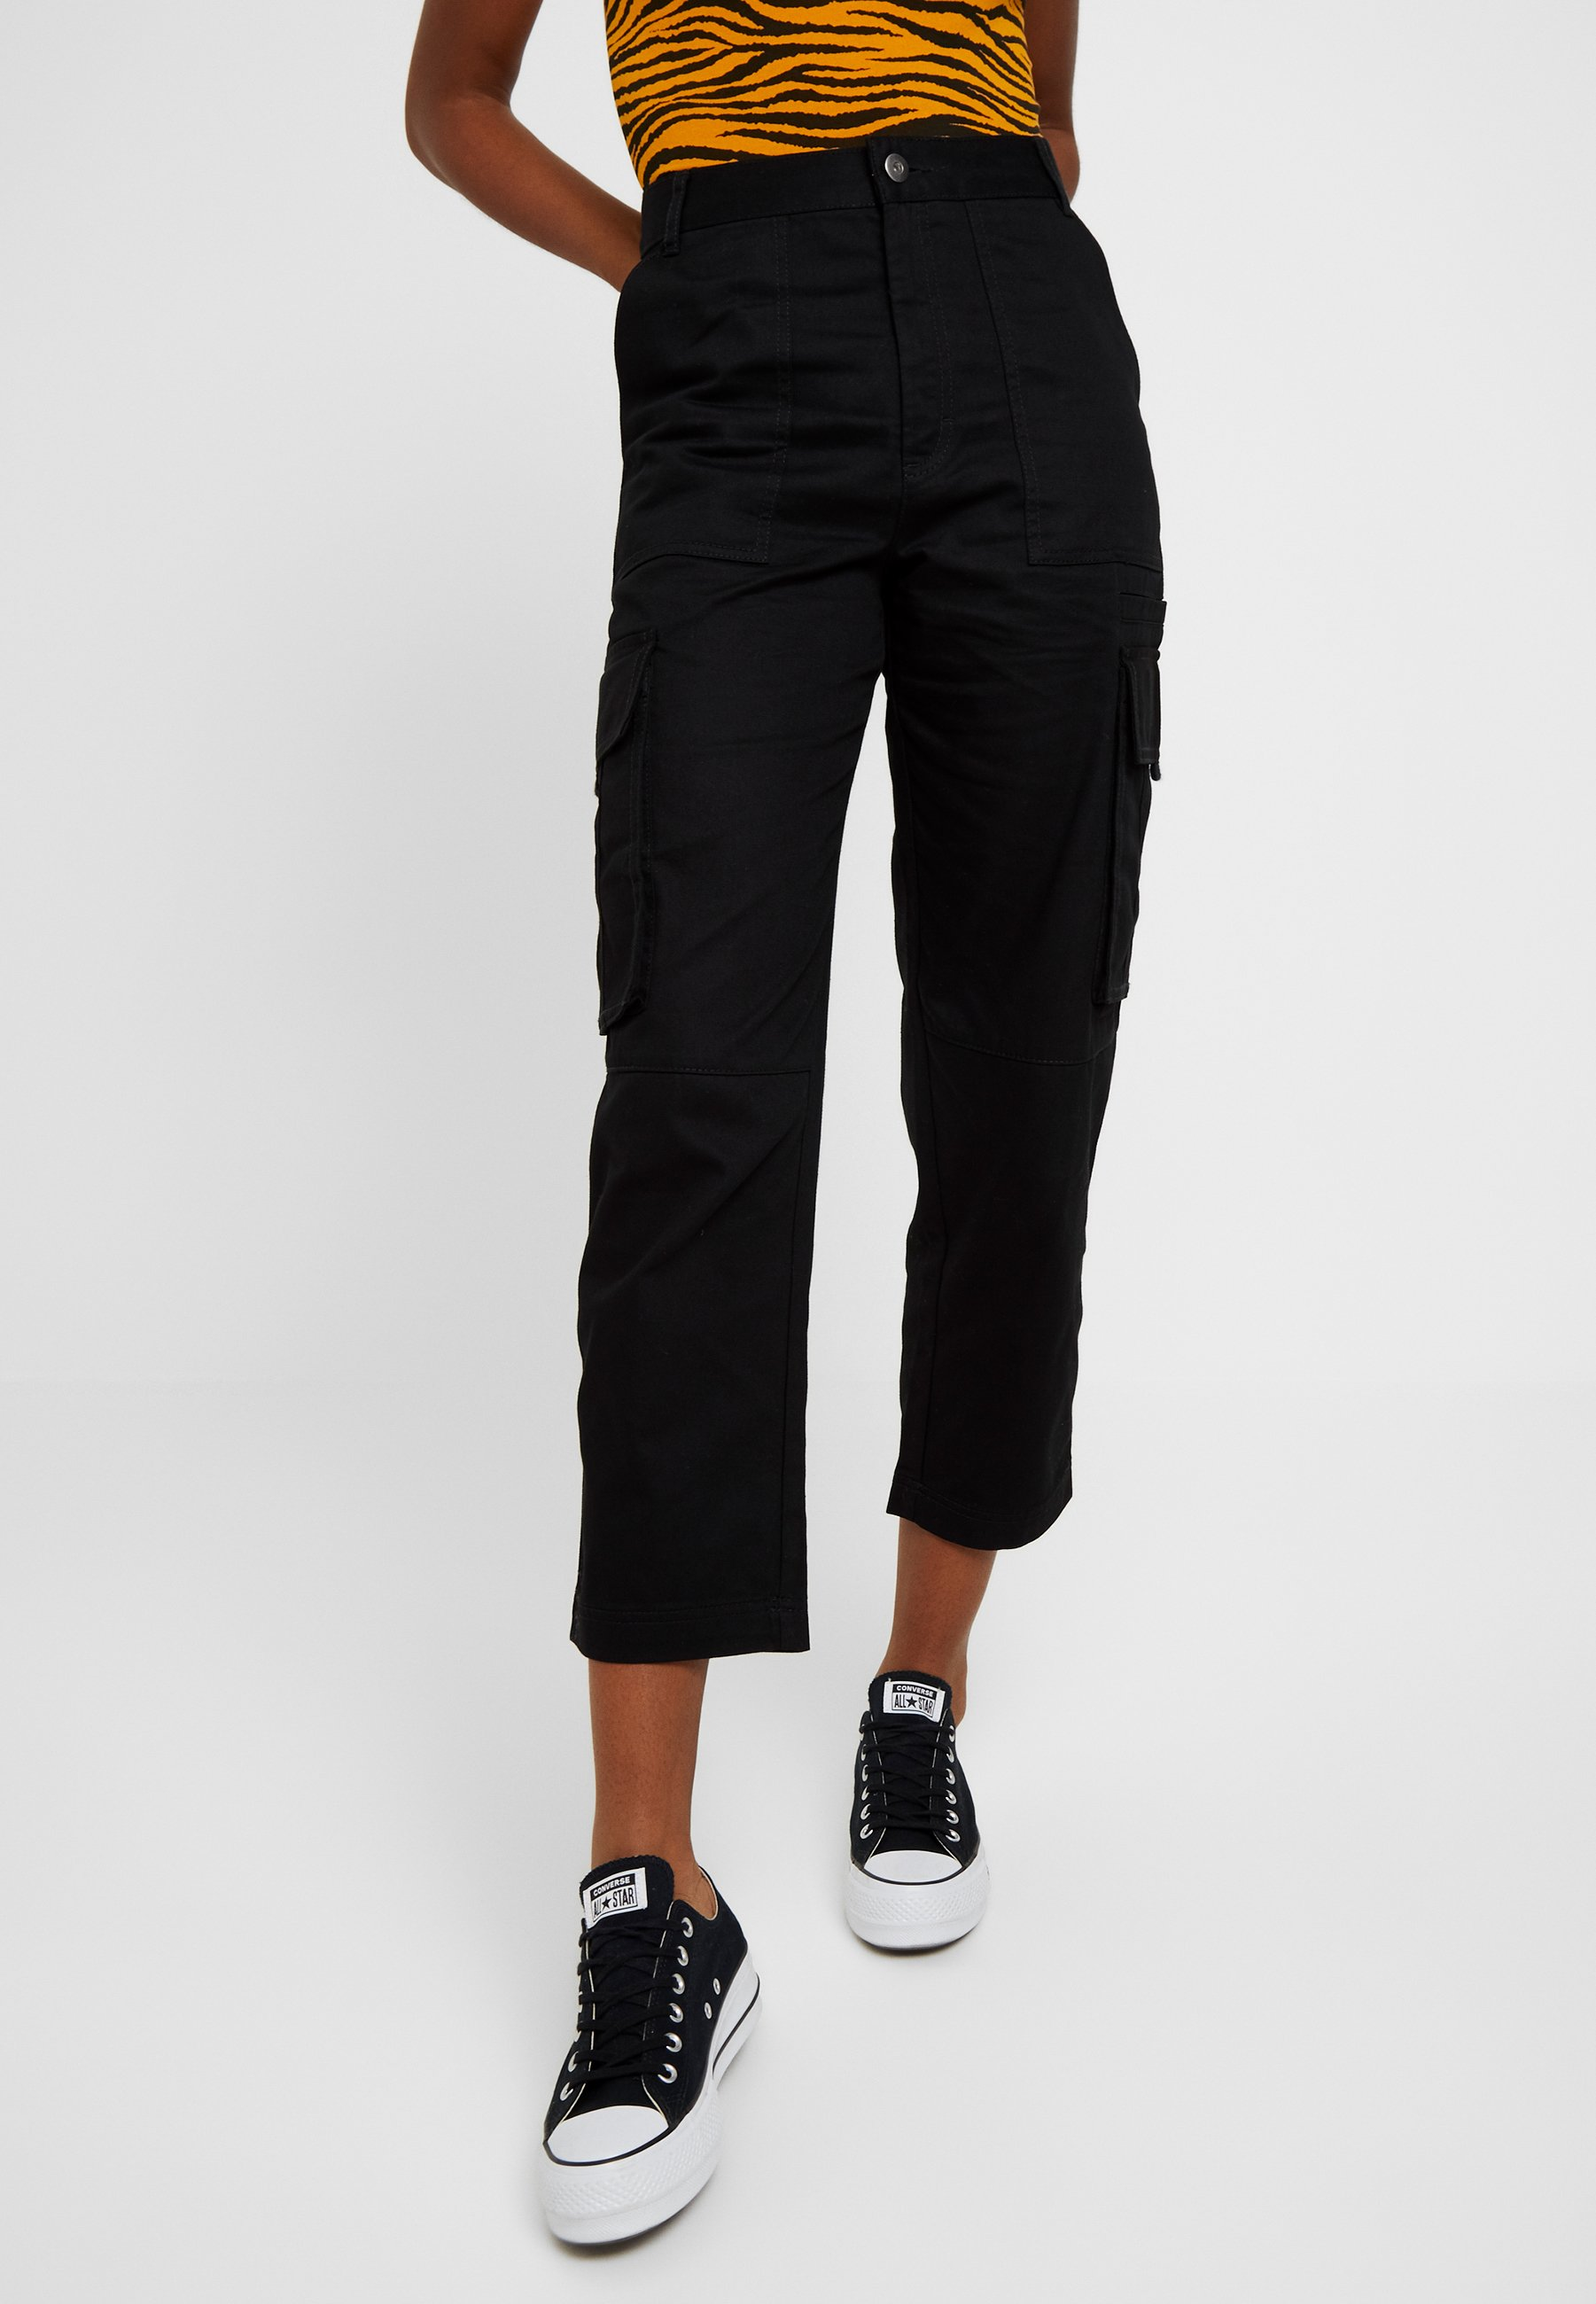 Cailyn Monki Classique Dark TrousersPantalon Black Solid 5jR34LqA